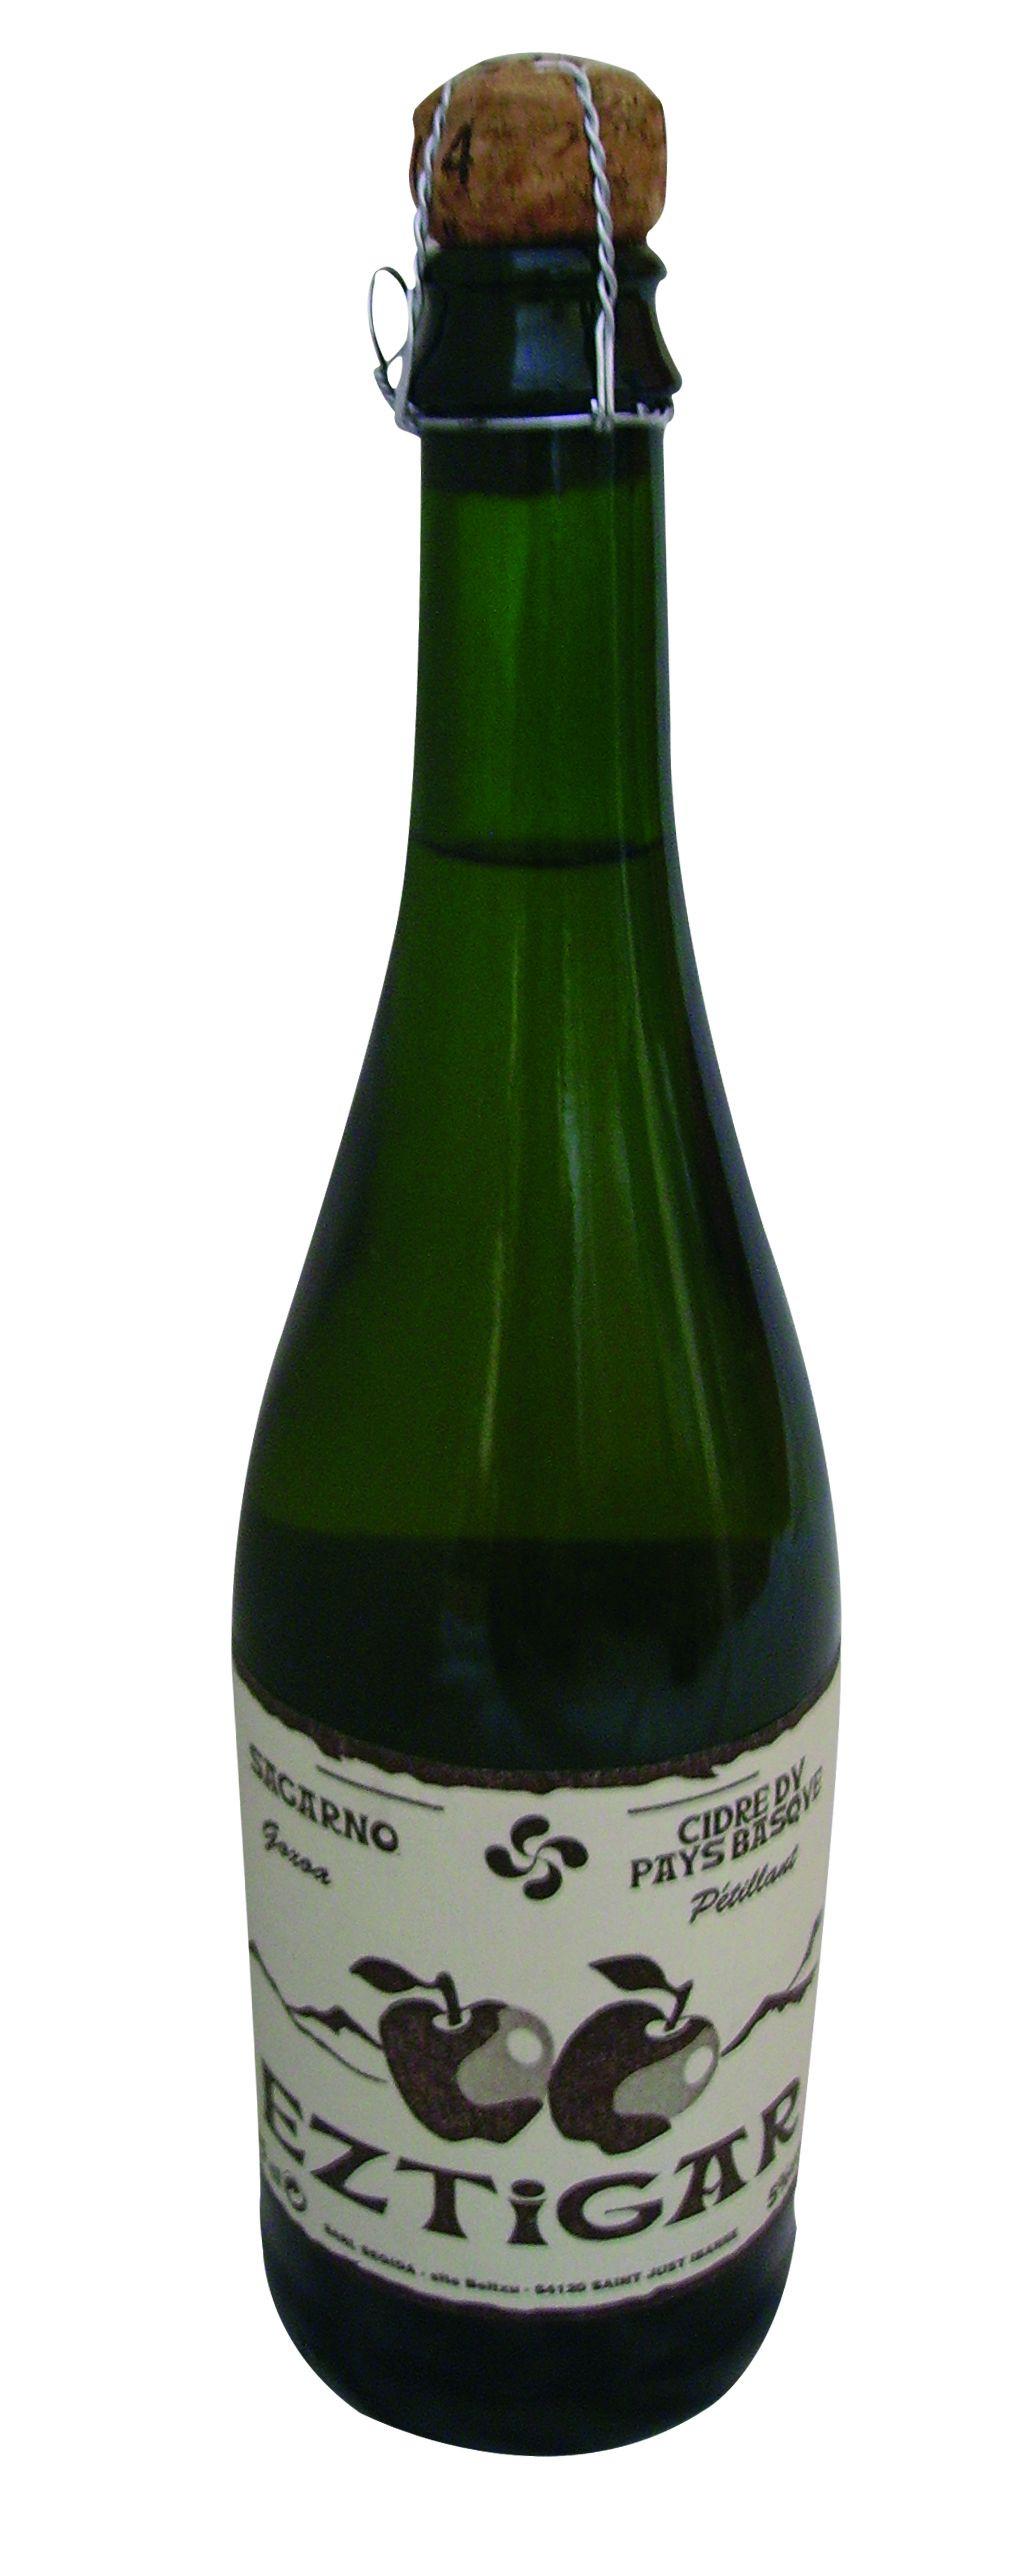 Le cidre du Pays Basque, sagarnoa